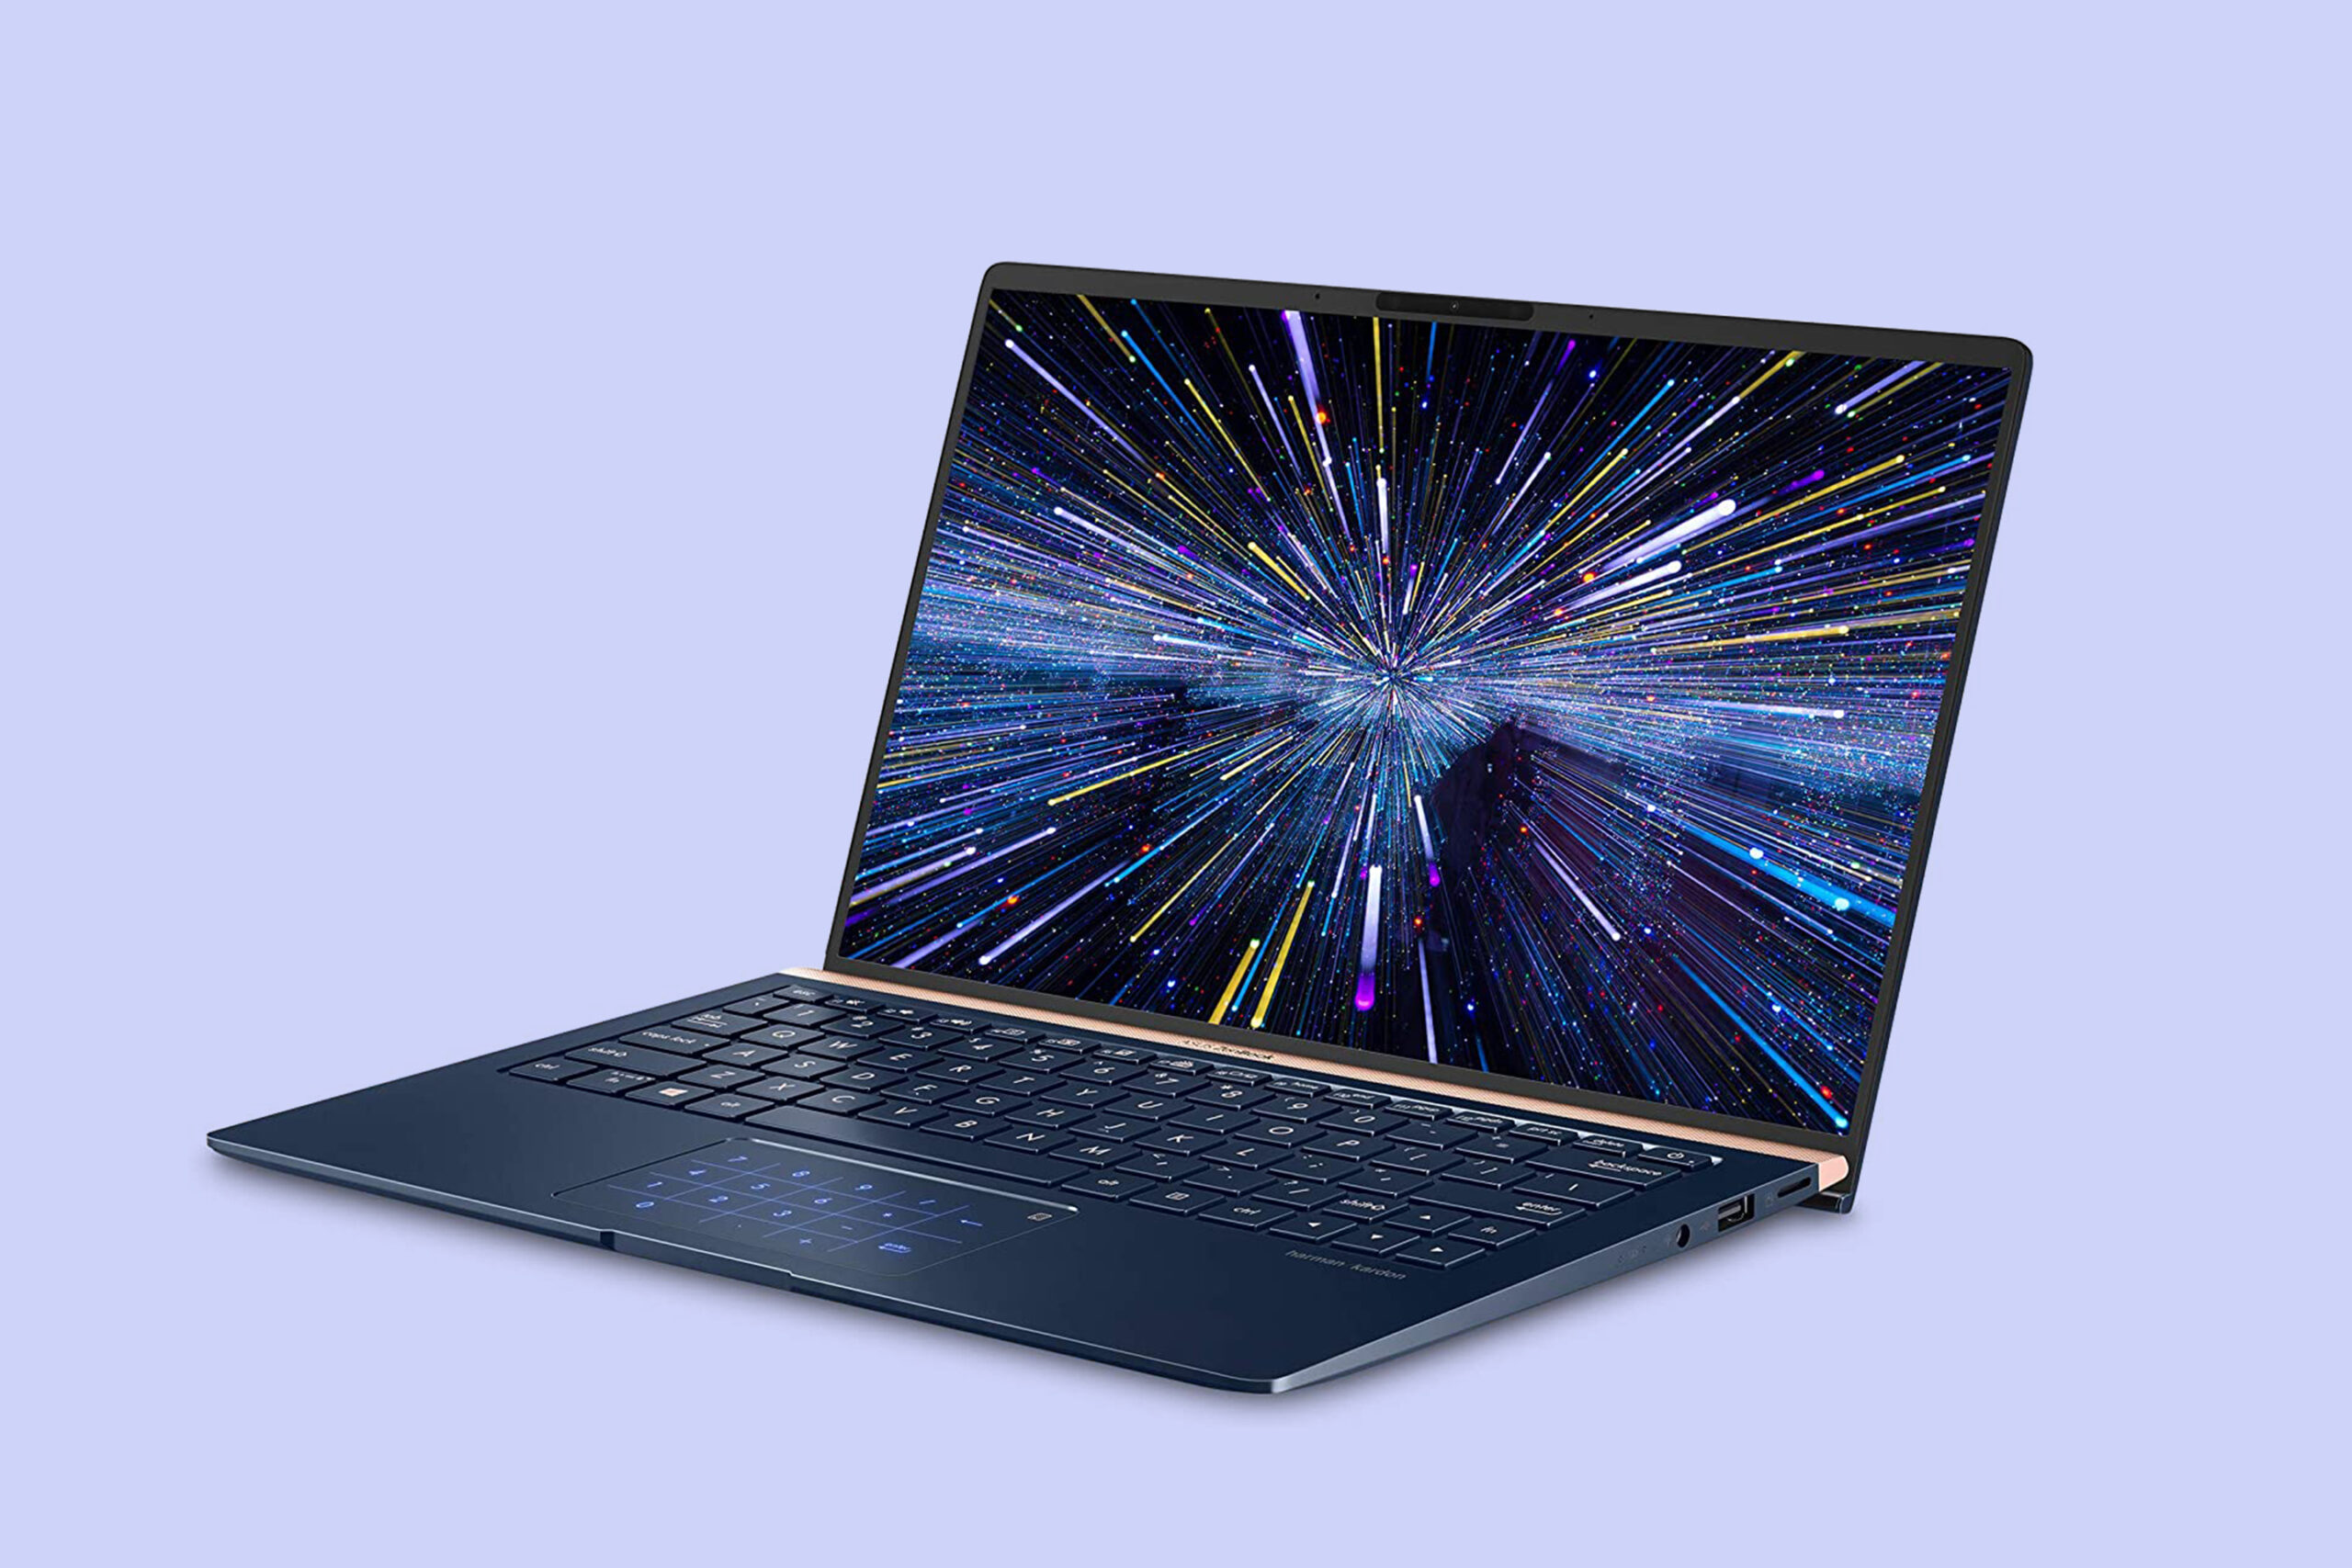 Best Laptop for Homeschool Students